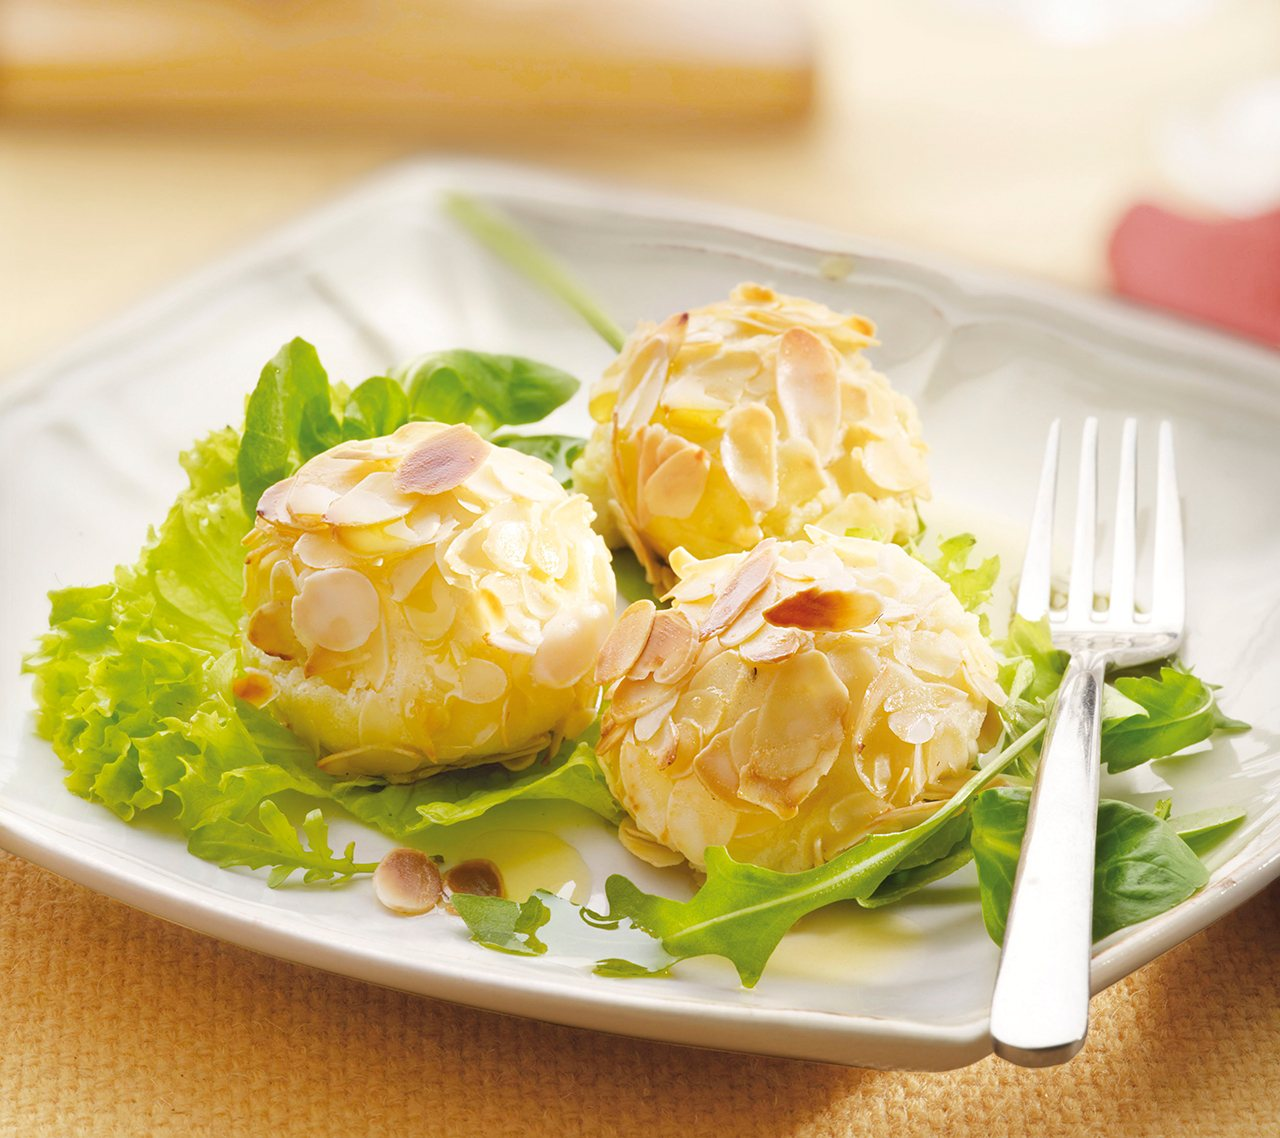 Recetas originales con patata - Albondigas de patata ...